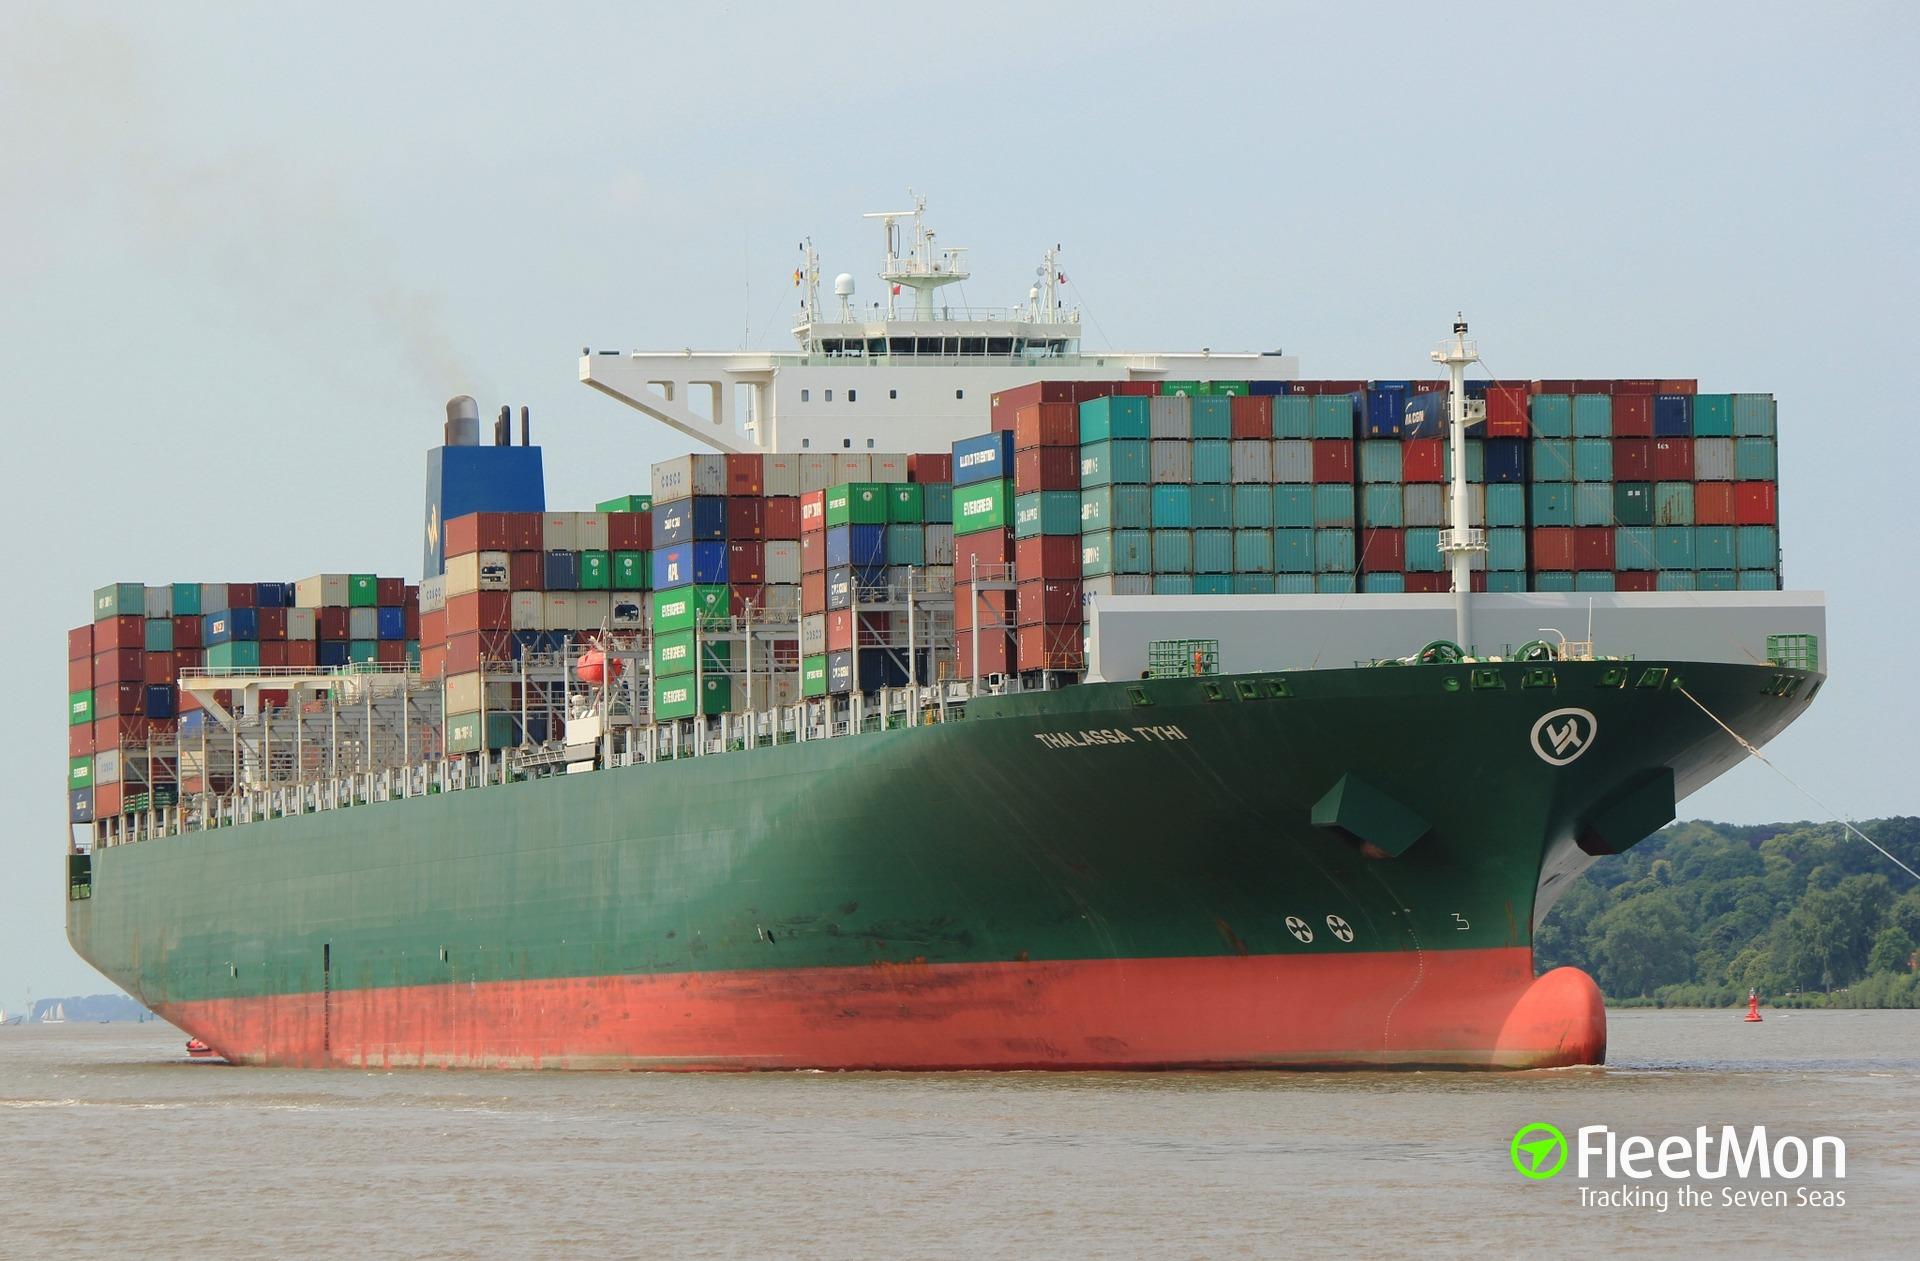 Mega container ship damaged by crane in Hamburg, still under repairs